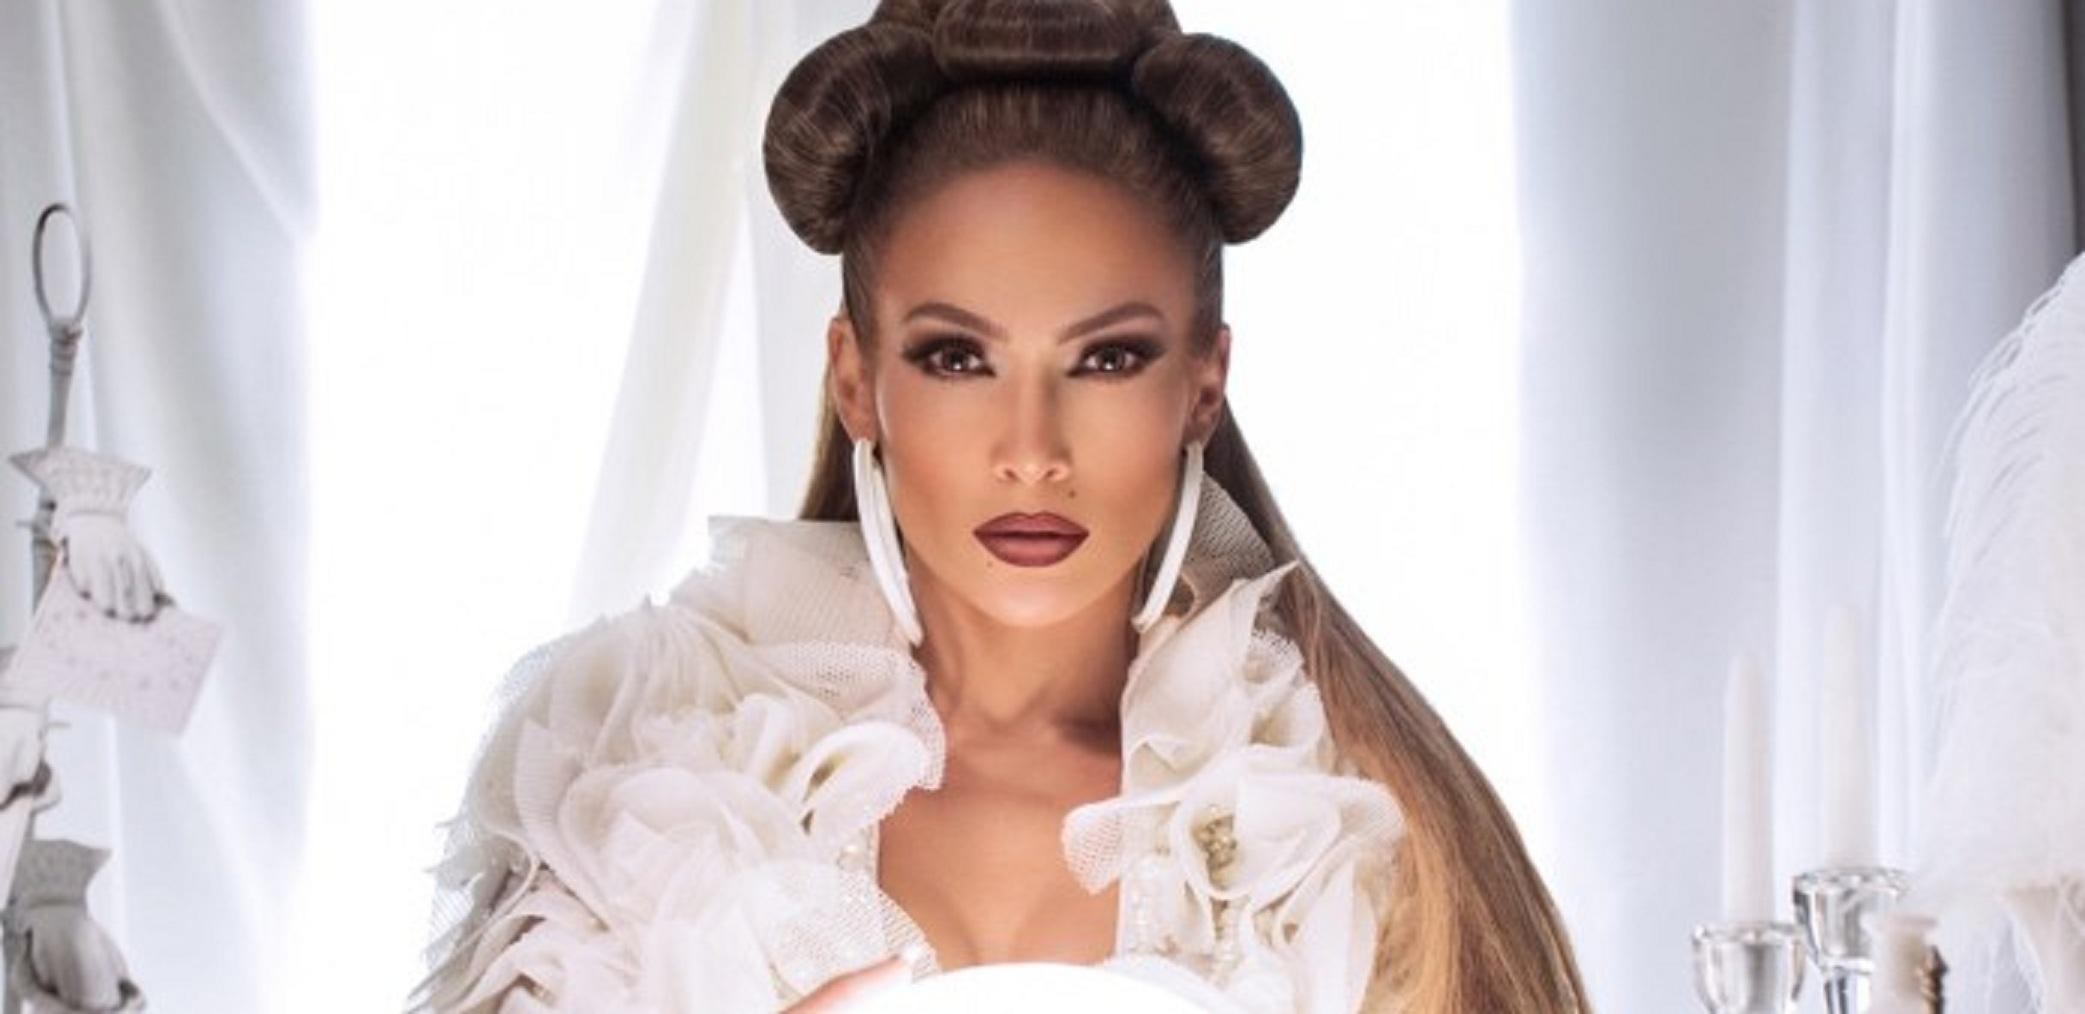 Watch: Jennifer Lopez's HOT New Music Video For 'Medicine'